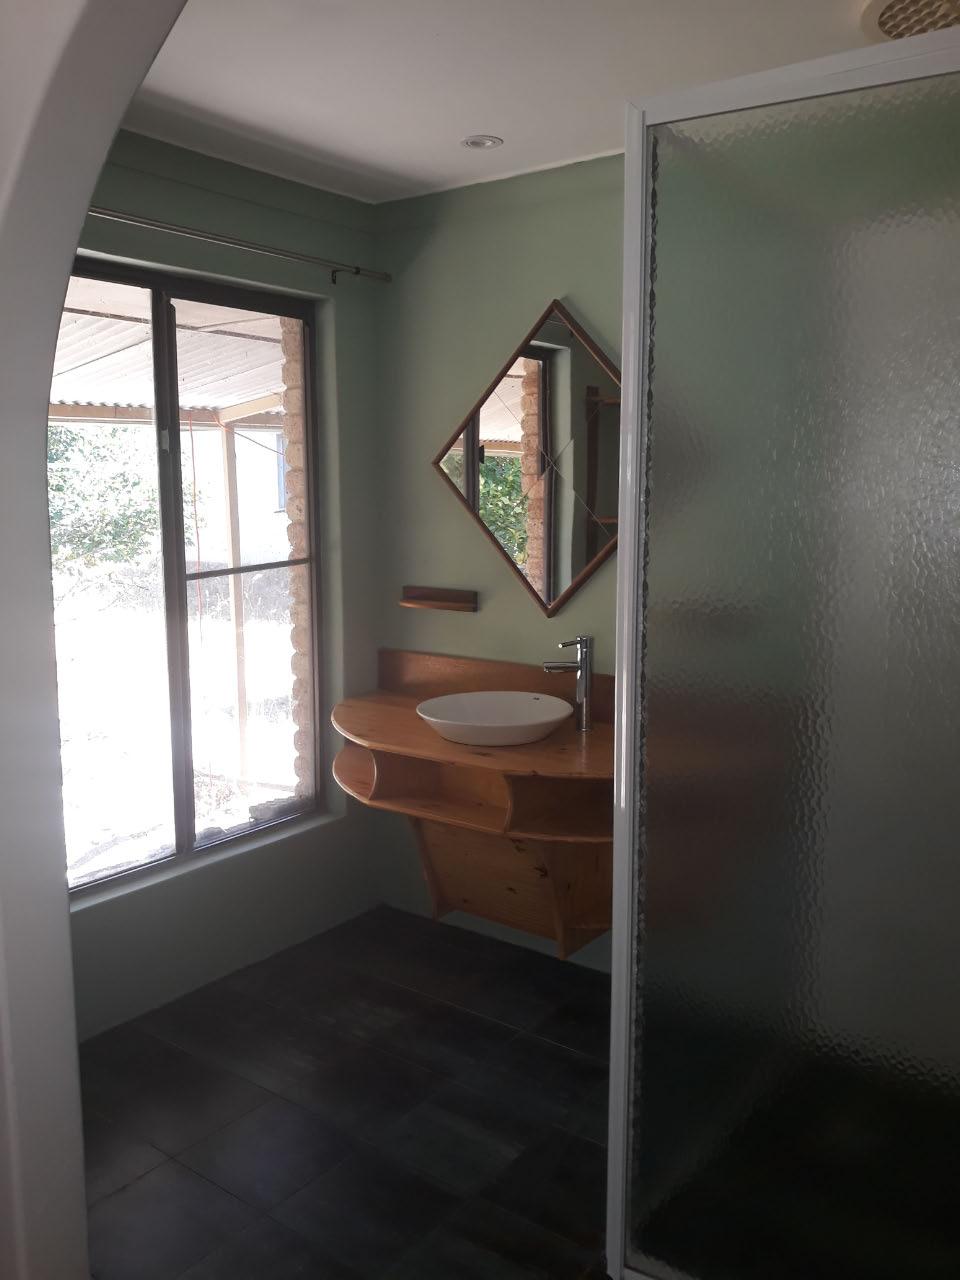 ensuite bath room (master bedroom)